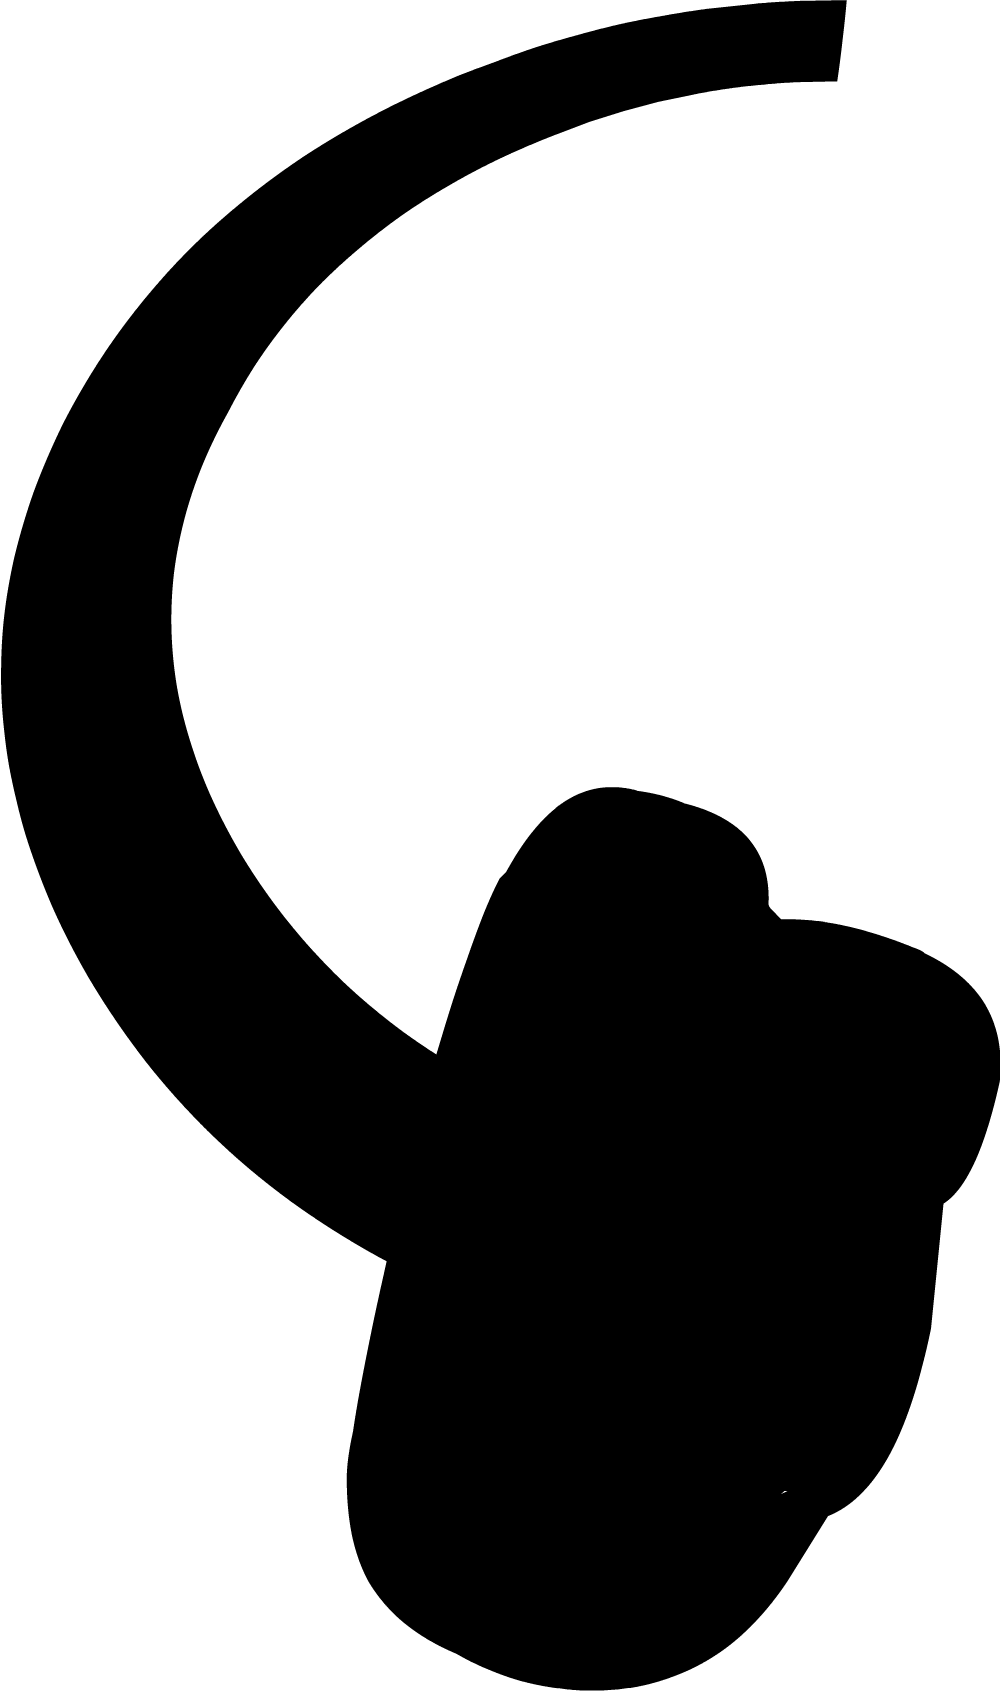 1000x1691 Image